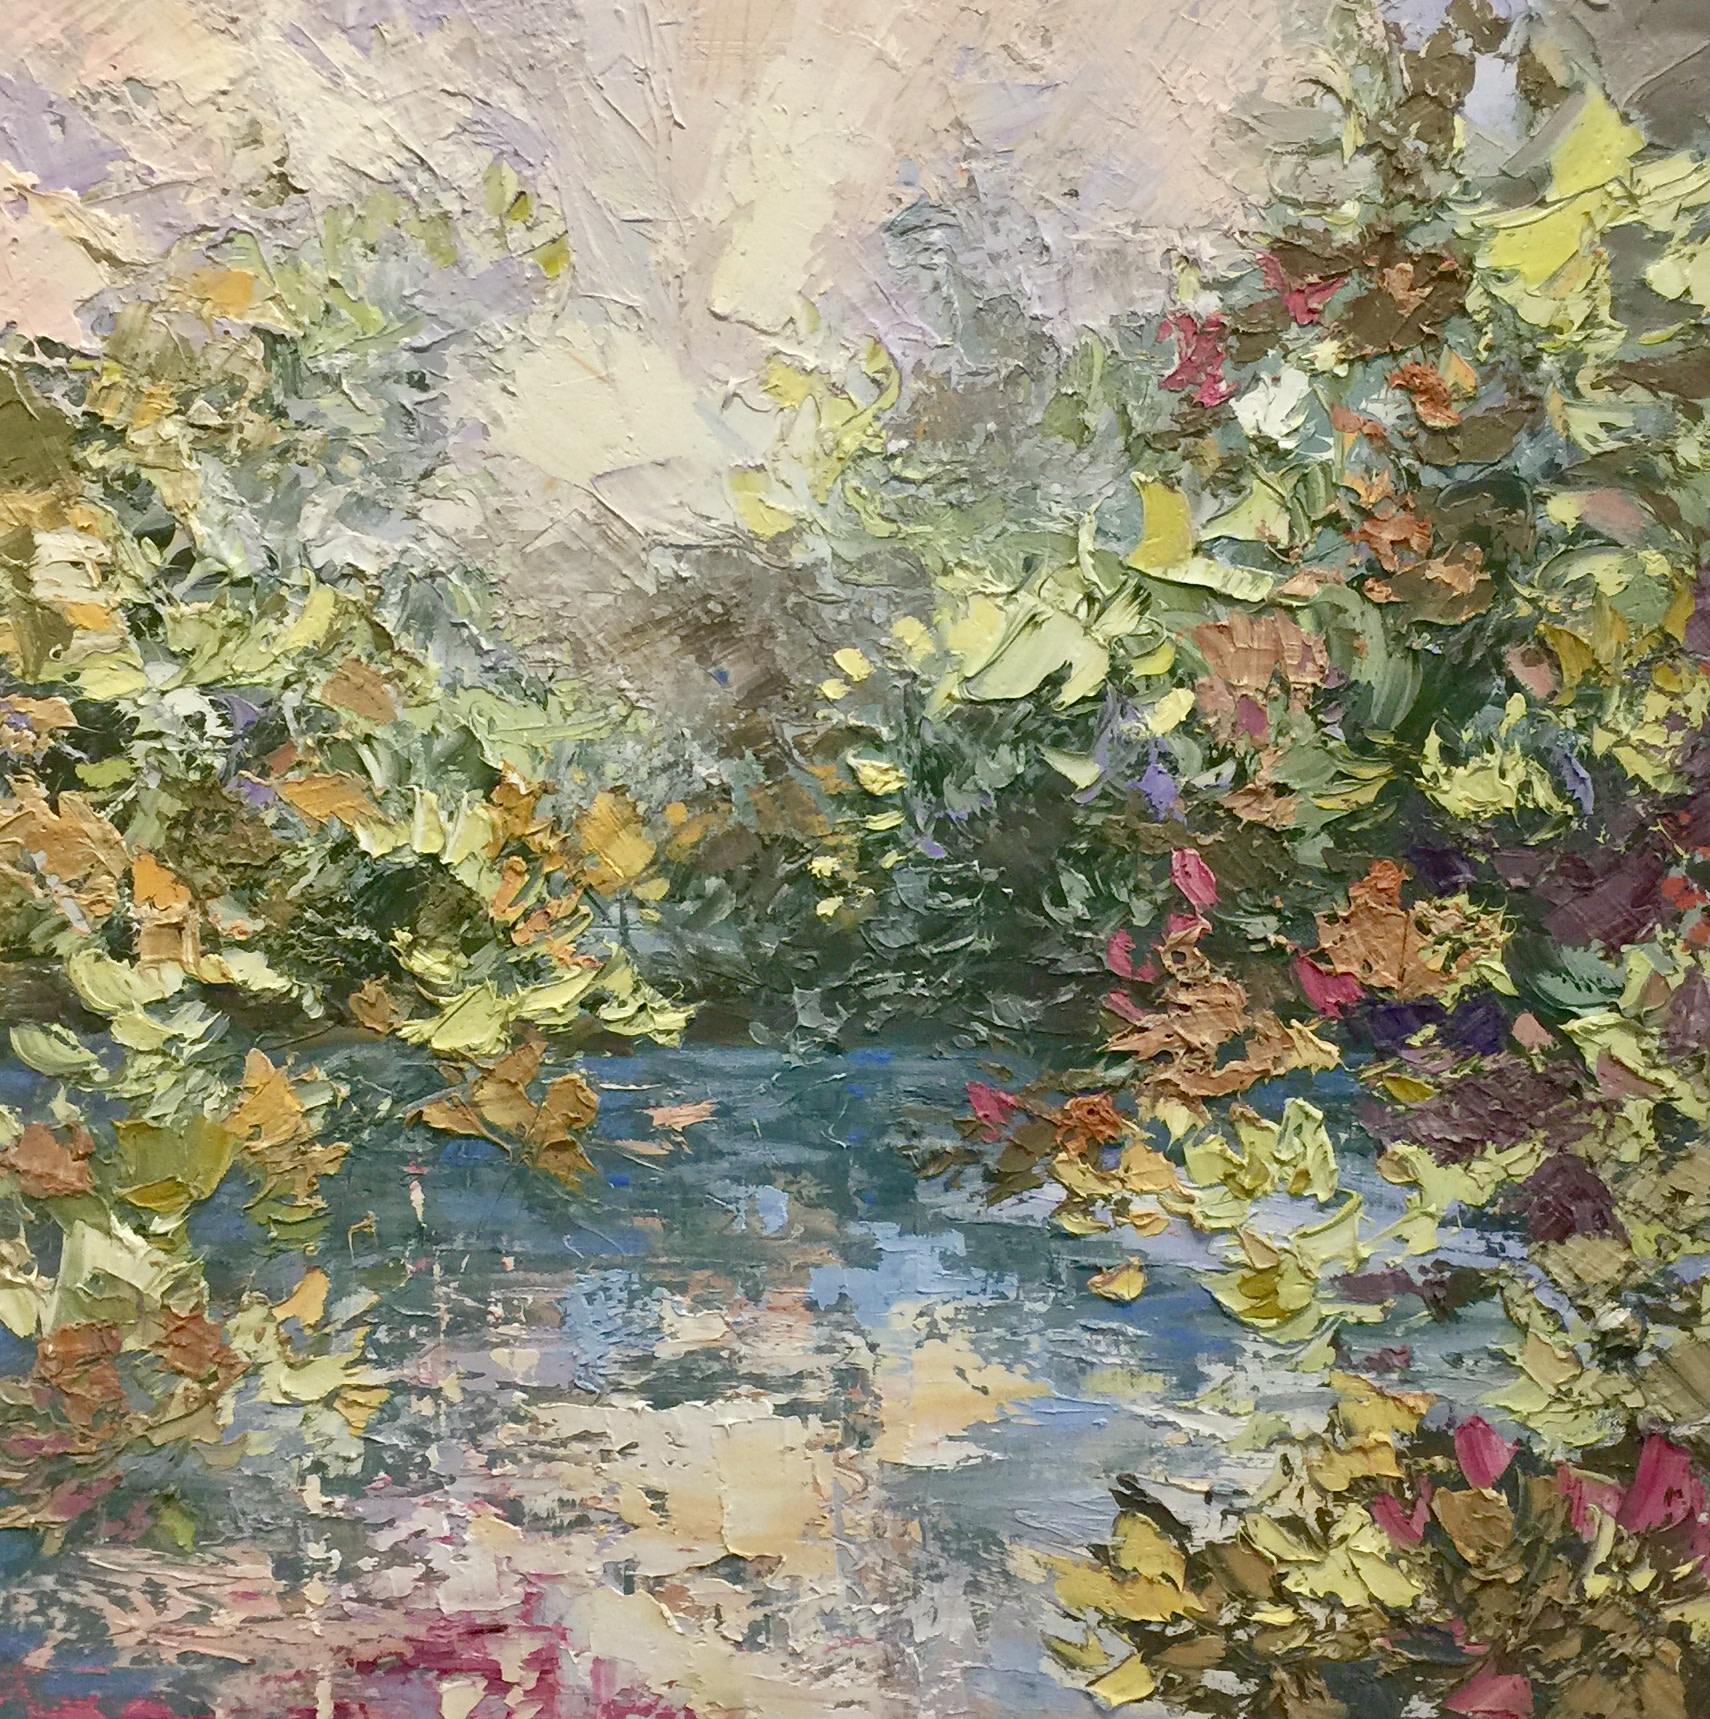 <span class=&#34;link fancybox-details-link&#34;><a href=&#34;/artists/193-paul-treasure/works/2695-paul-treasure-garnet/&#34;>View Detail Page</a></span><div class=&#34;artist&#34;><strong>Paul Treasure</strong></div> <div class=&#34;title&#34;><em>Garnet</em></div> <div class=&#34;medium&#34;>Oil on Canvas</div> <div class=&#34;dimensions&#34;>60 x 60 cm</div><div class=&#34;price&#34;>£2,800.00</div><div class=&#34;copyright_line&#34;>ART Salon</div>